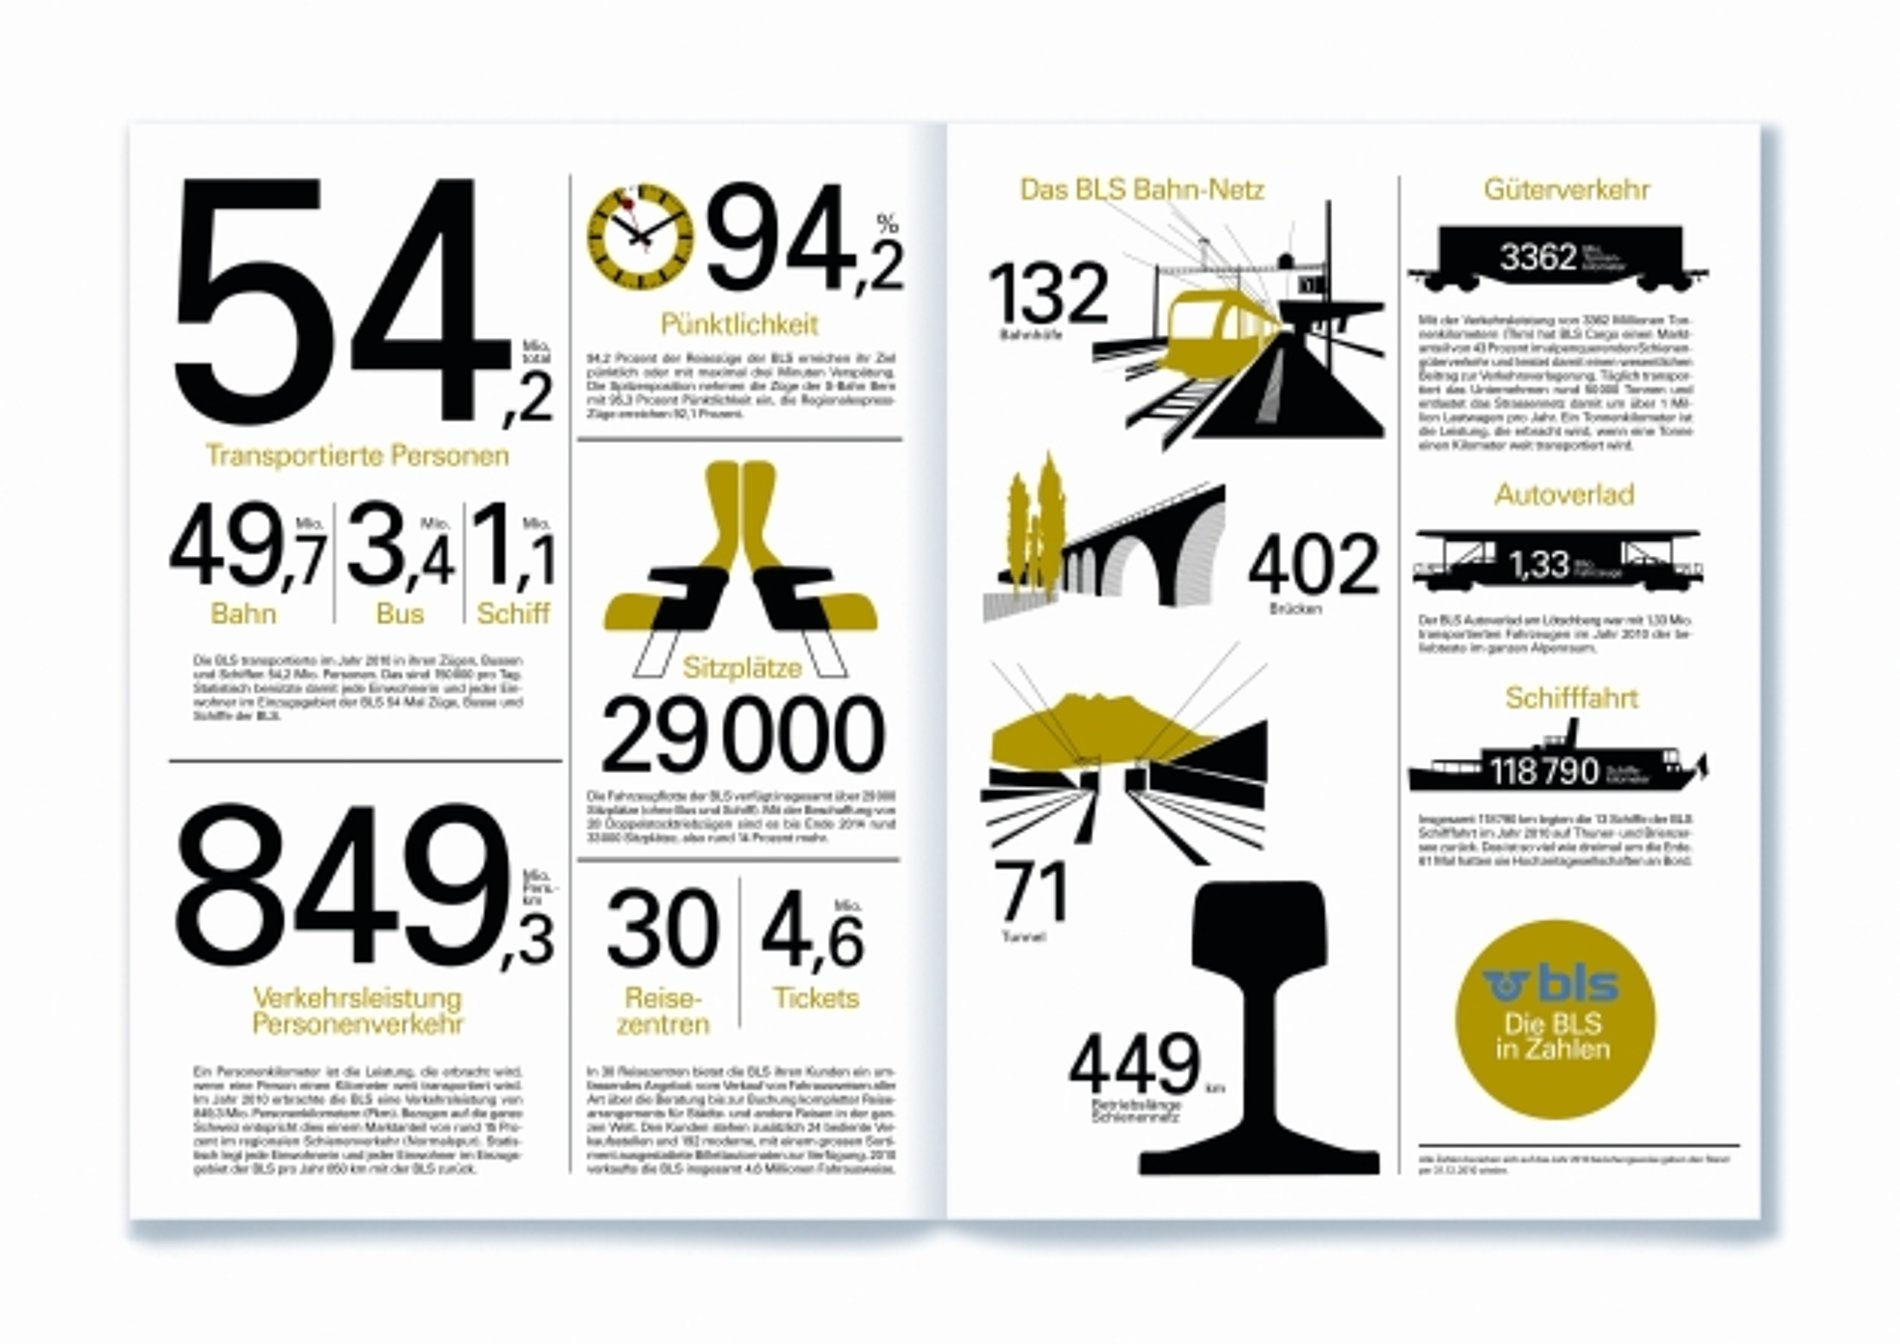 BLS Annual Report 2010 | Red Dot Design Award